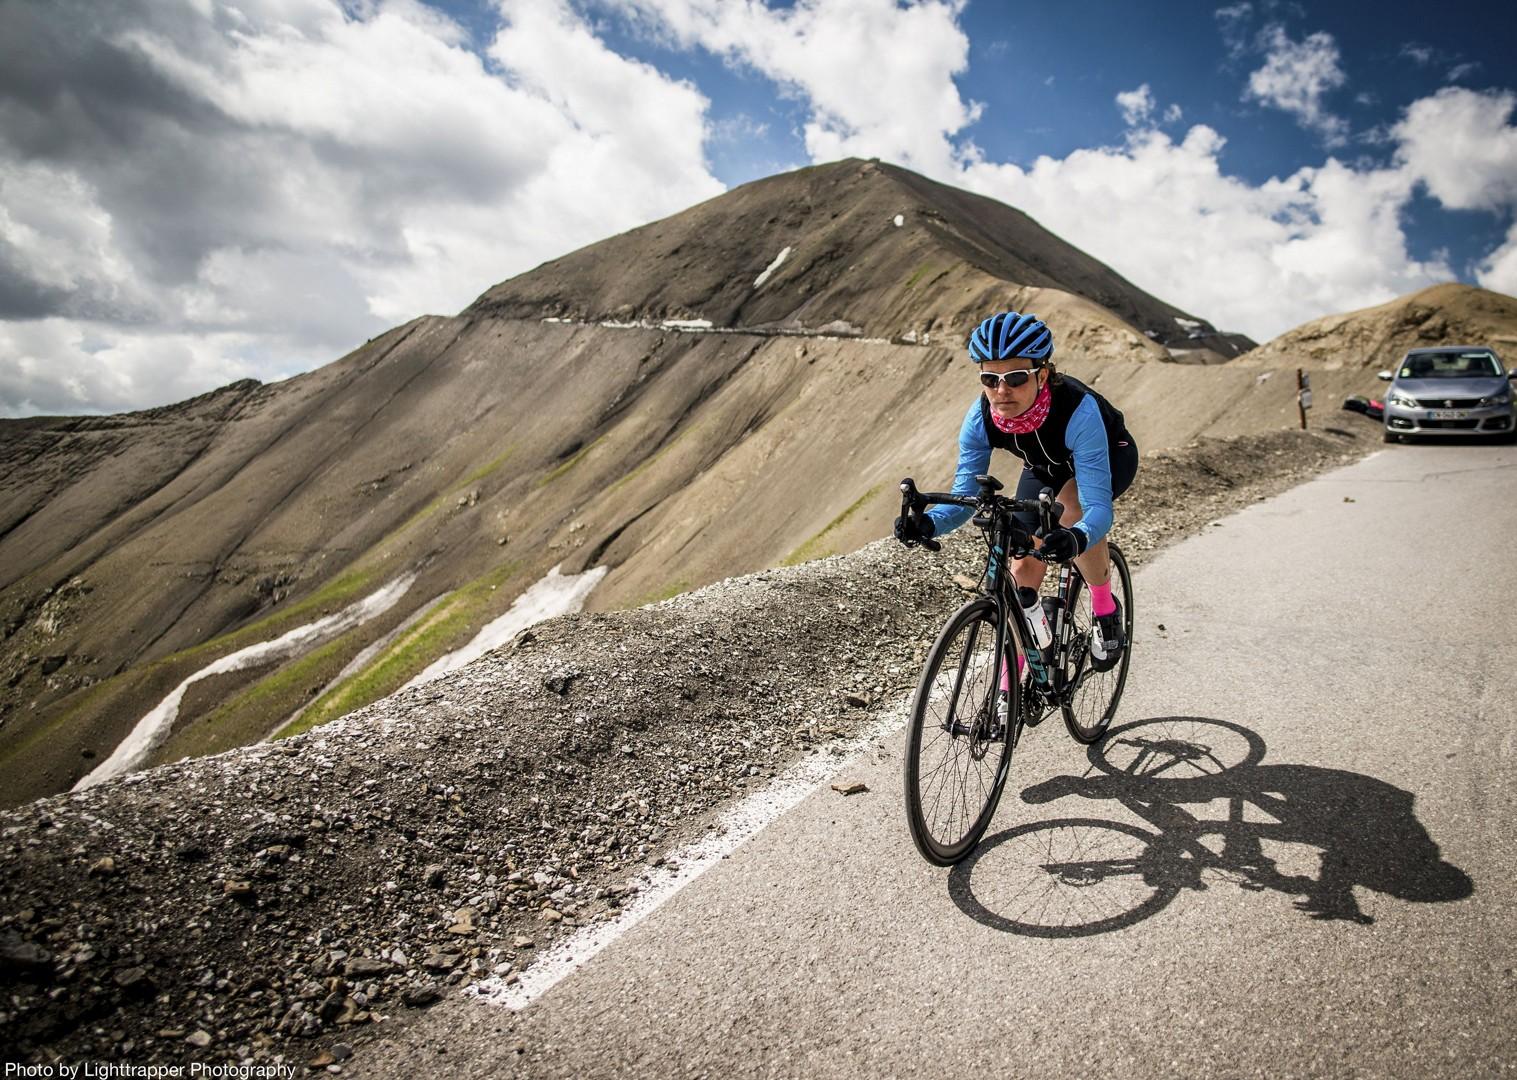 high-speed-descents-alps-france-raid-alpine-road-cycling-holiday.jpg - France - Raid Alpine - Guided Road Cycling Holiday - Road Cycling